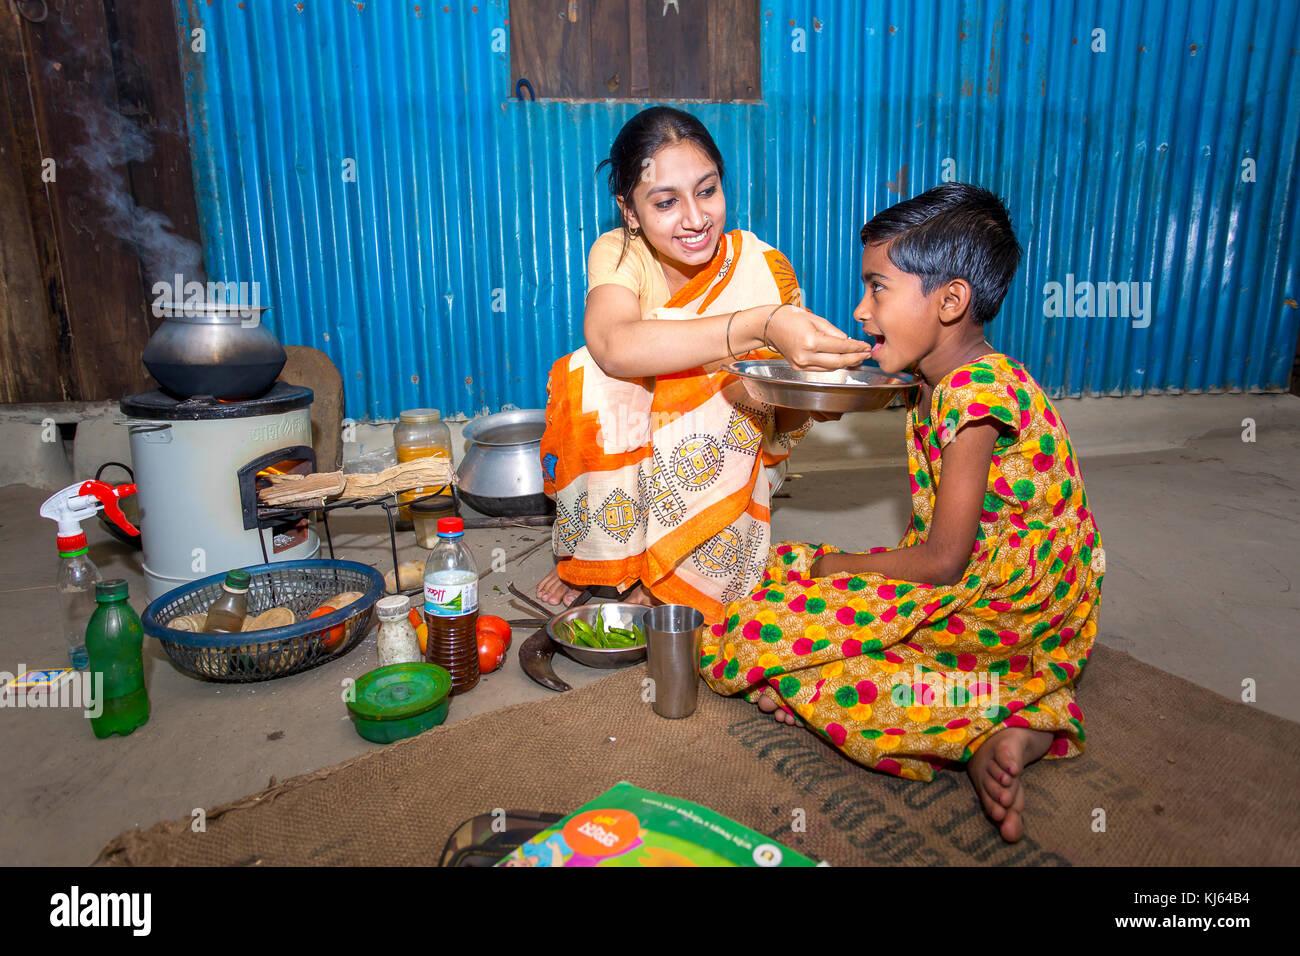 bangladesh family stockfotos bangladesh family bilder alamy. Black Bedroom Furniture Sets. Home Design Ideas